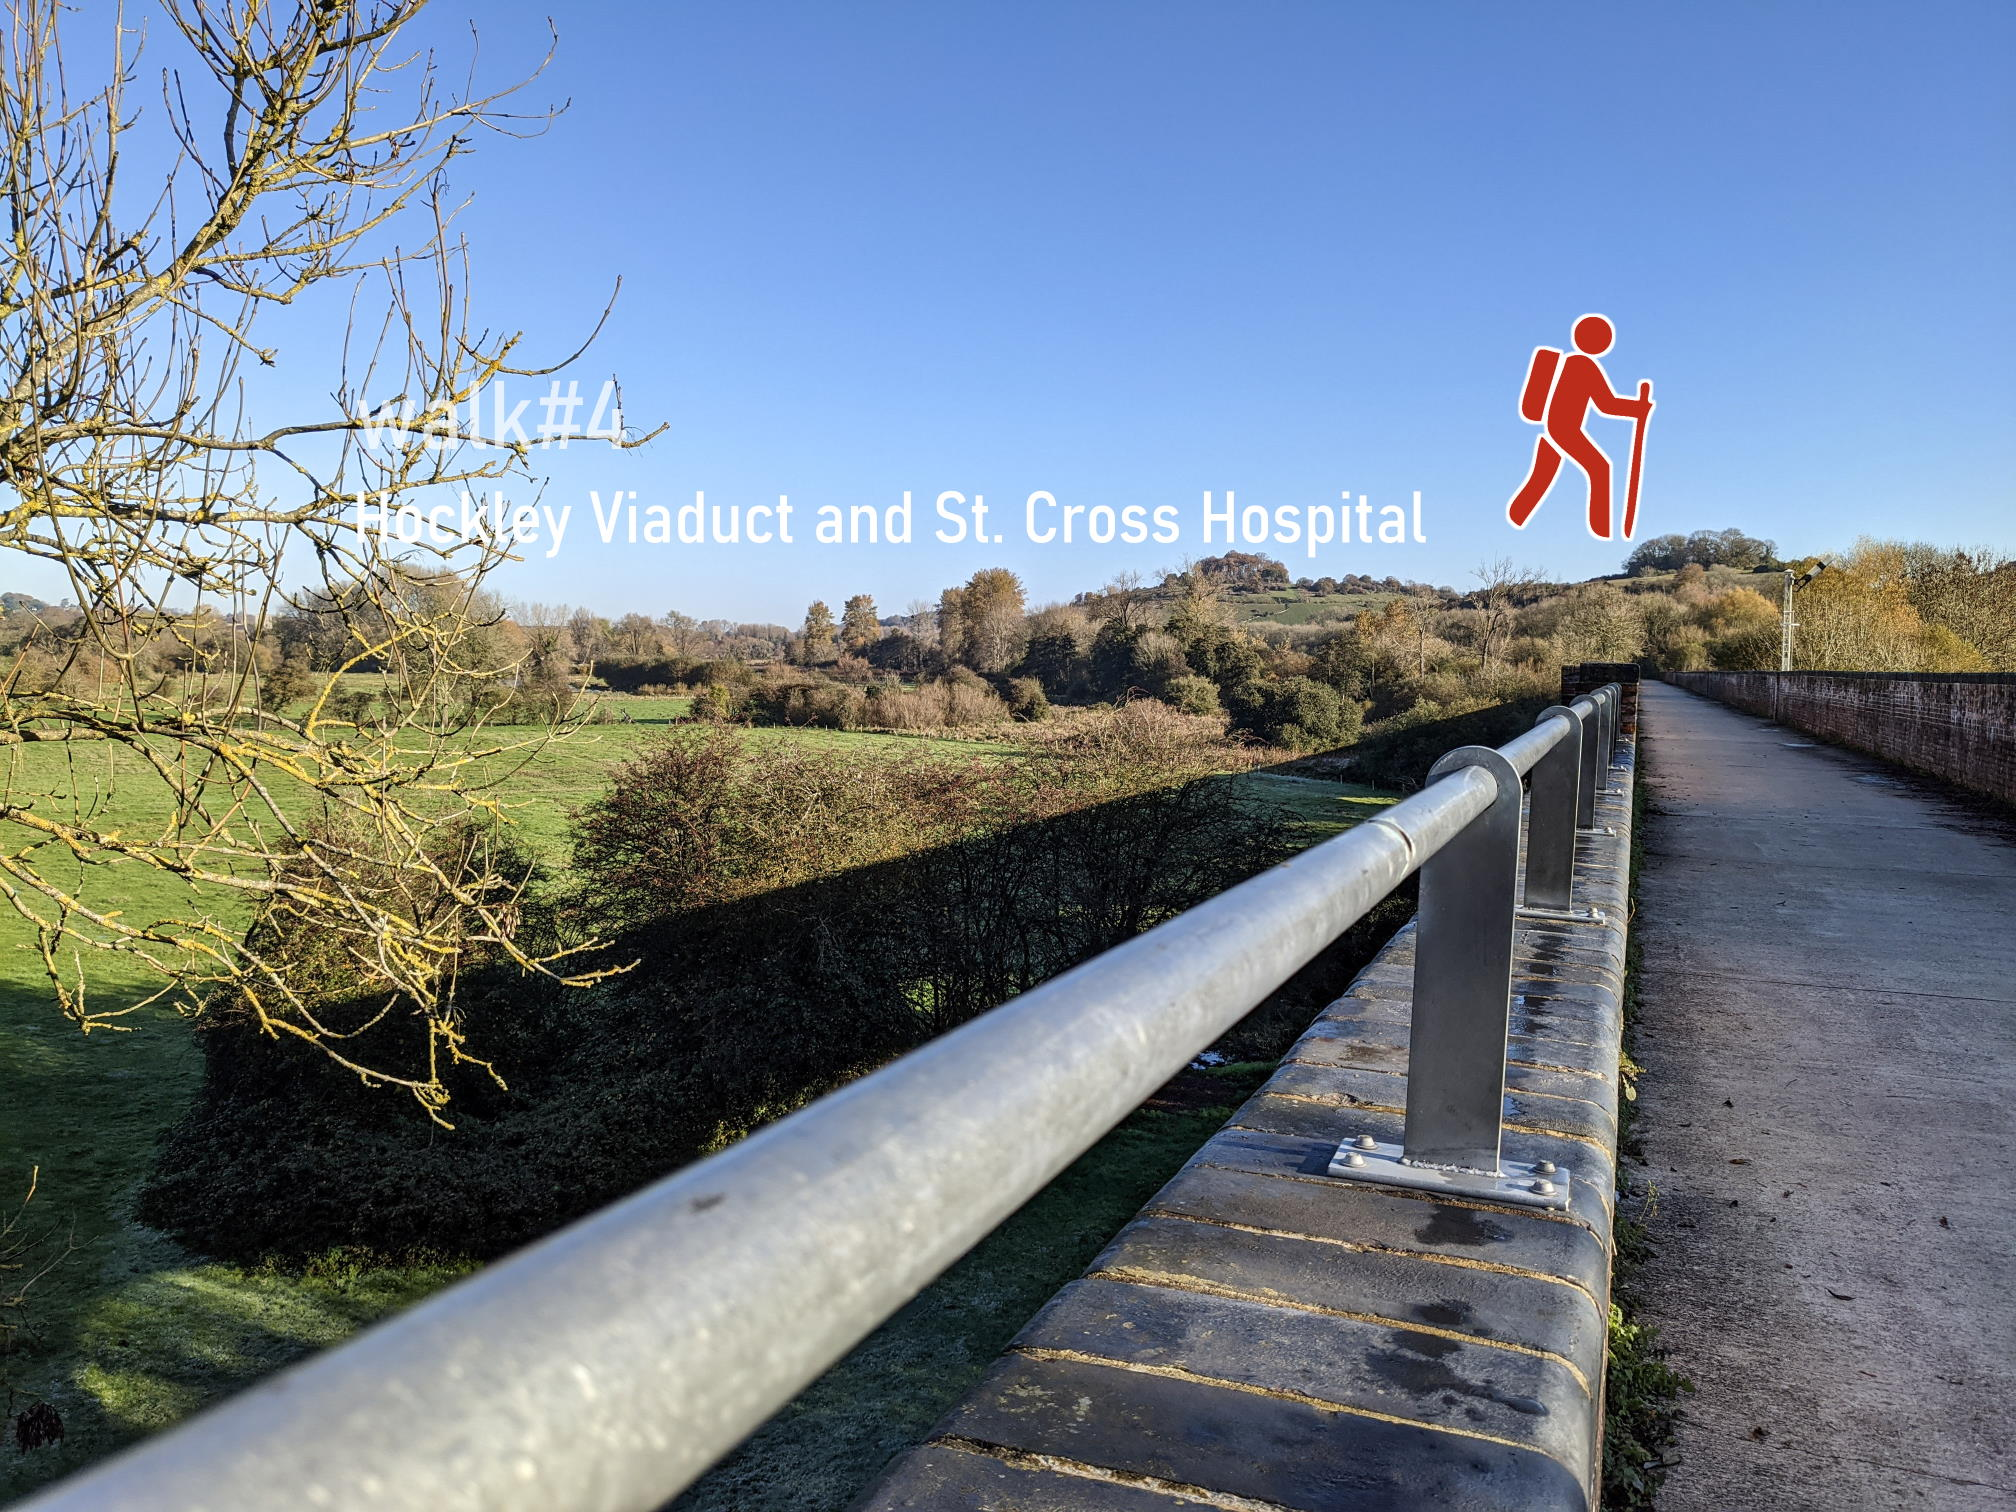 walk 4 - Hockley Viaduct and St. Cross Hospital